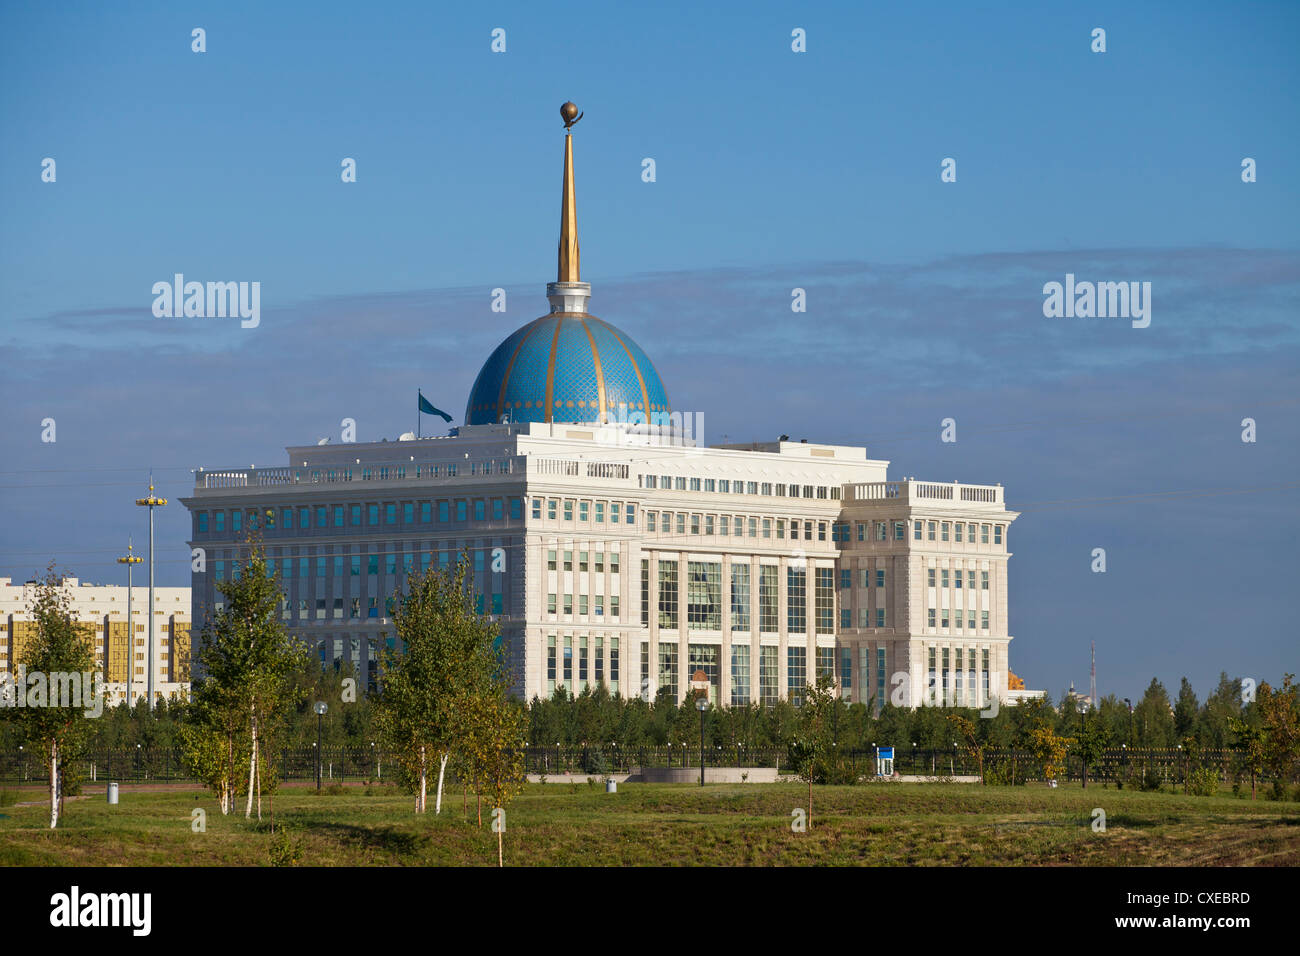 The Ak Orda, Presidential Palace of President Nursultan Nazarbayev, Astana, Kazakhstan, Central Asia, Asia - Stock Image